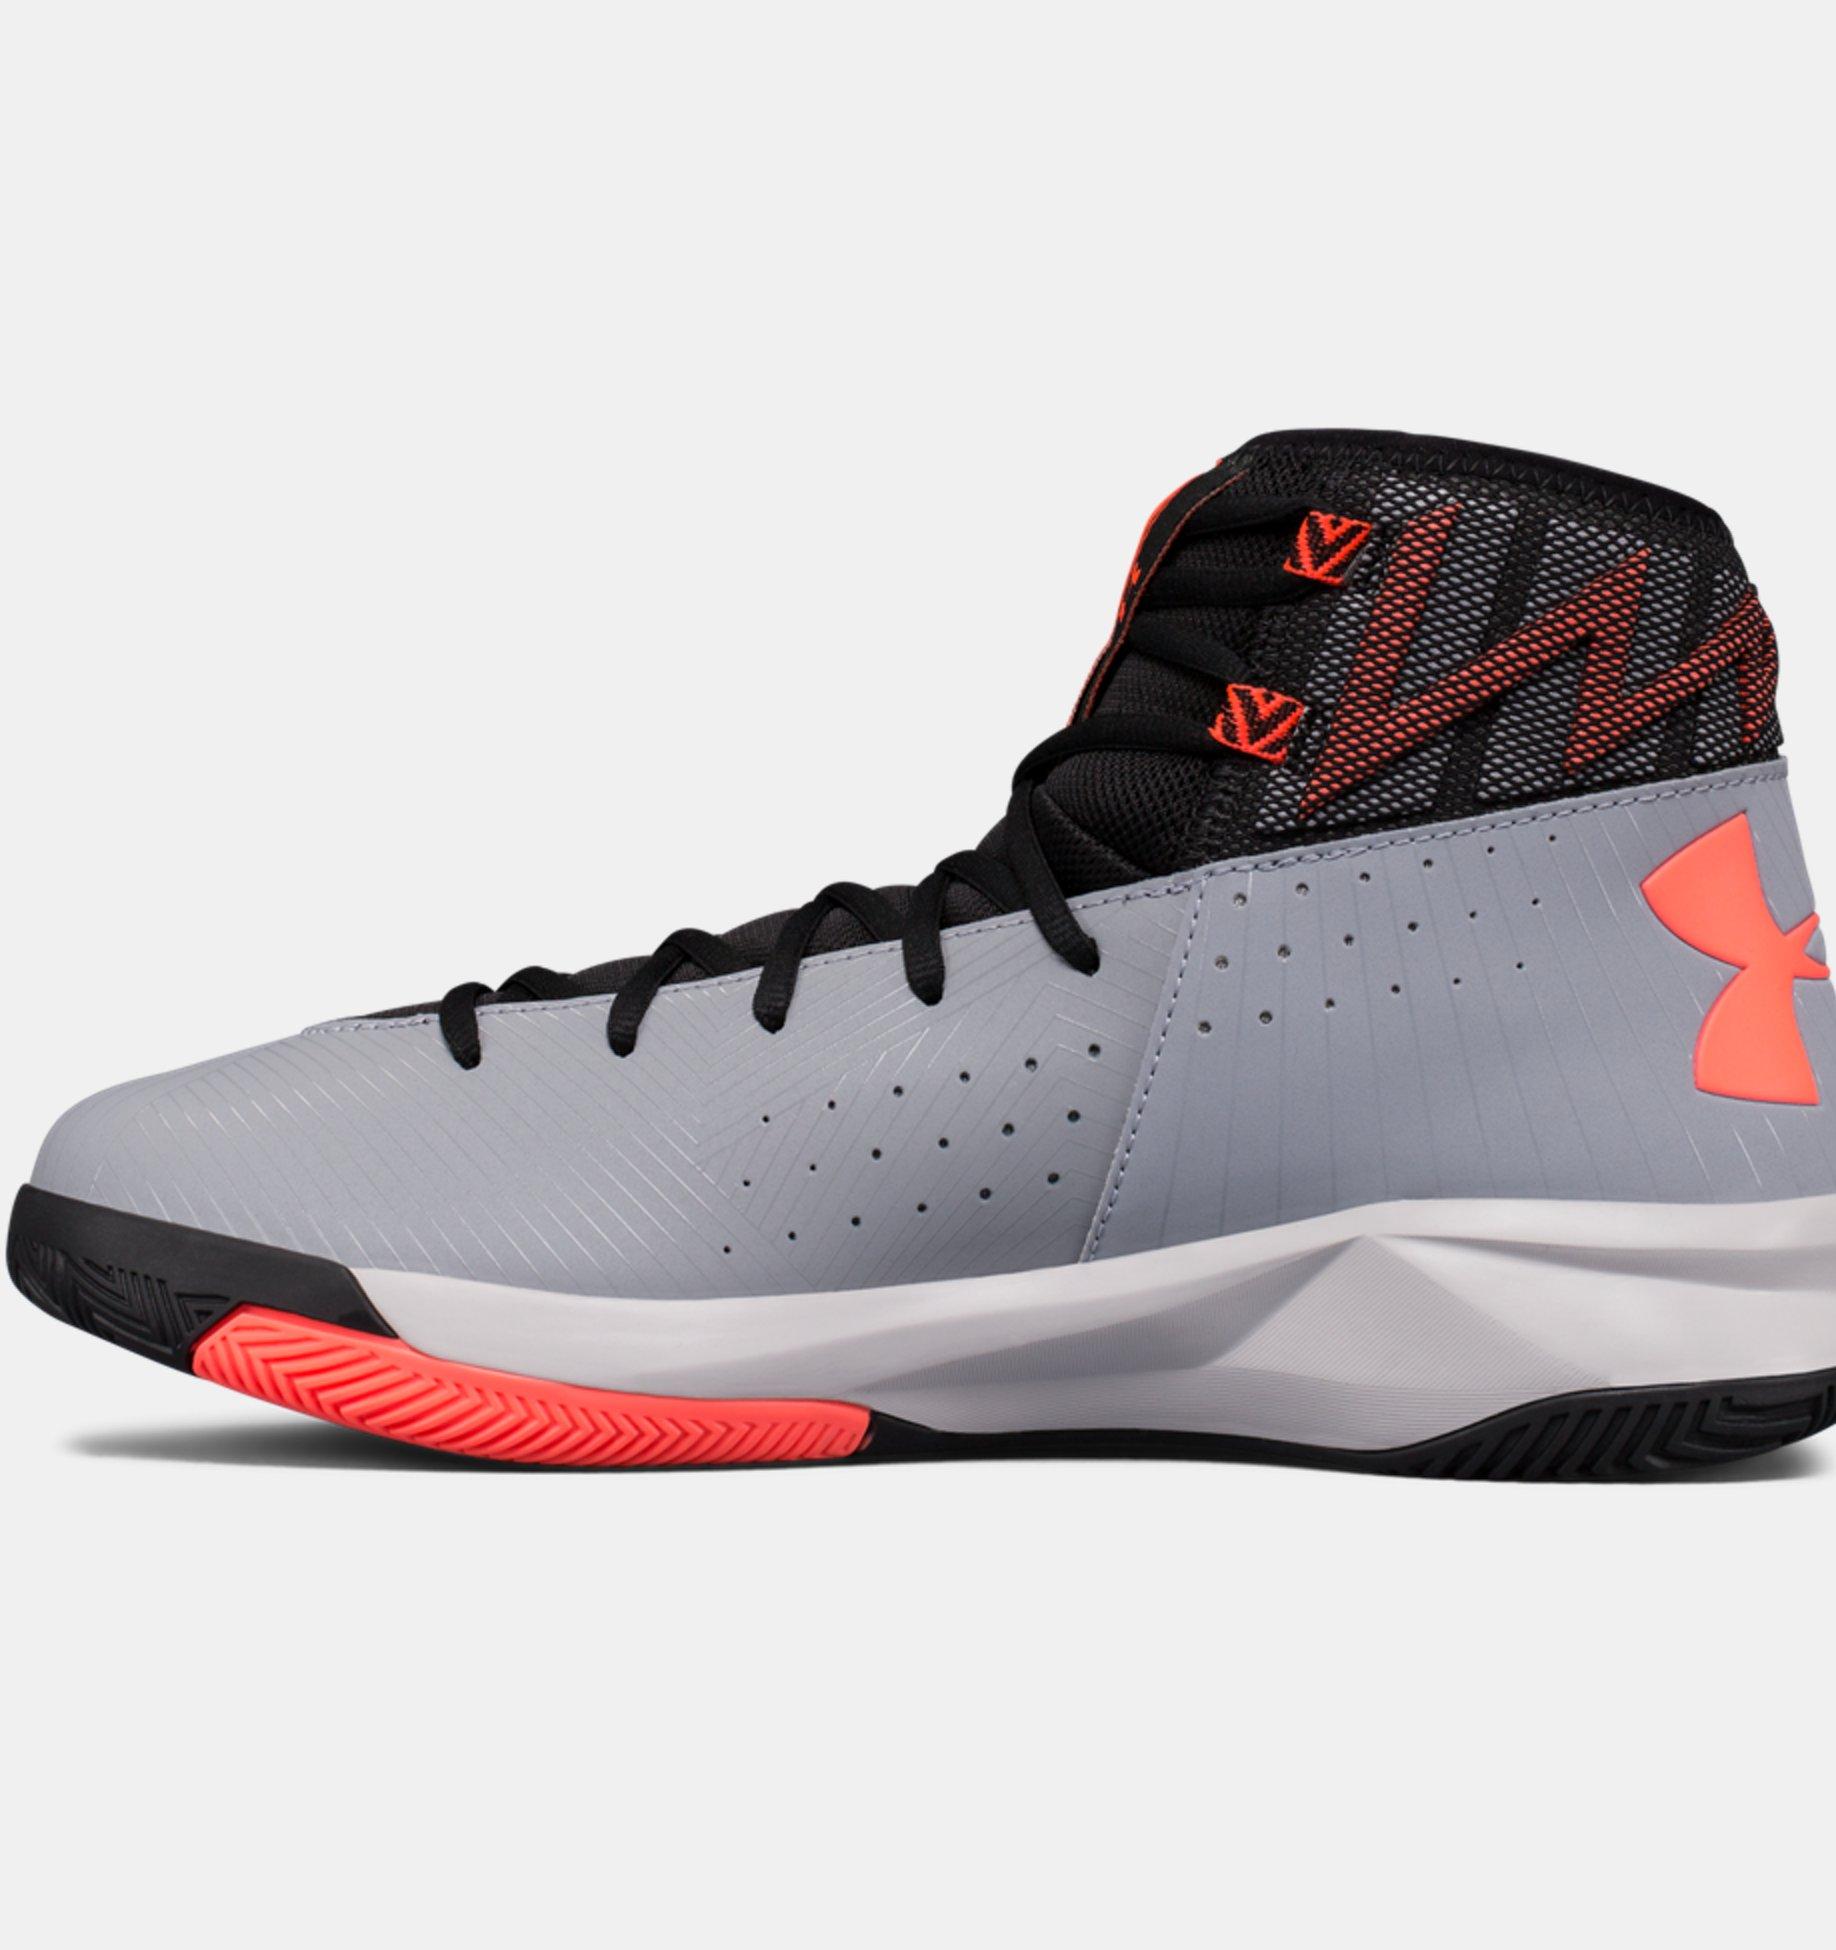 best service 455a9 23393 Men's UA Rocket 2 Basketball Shoes